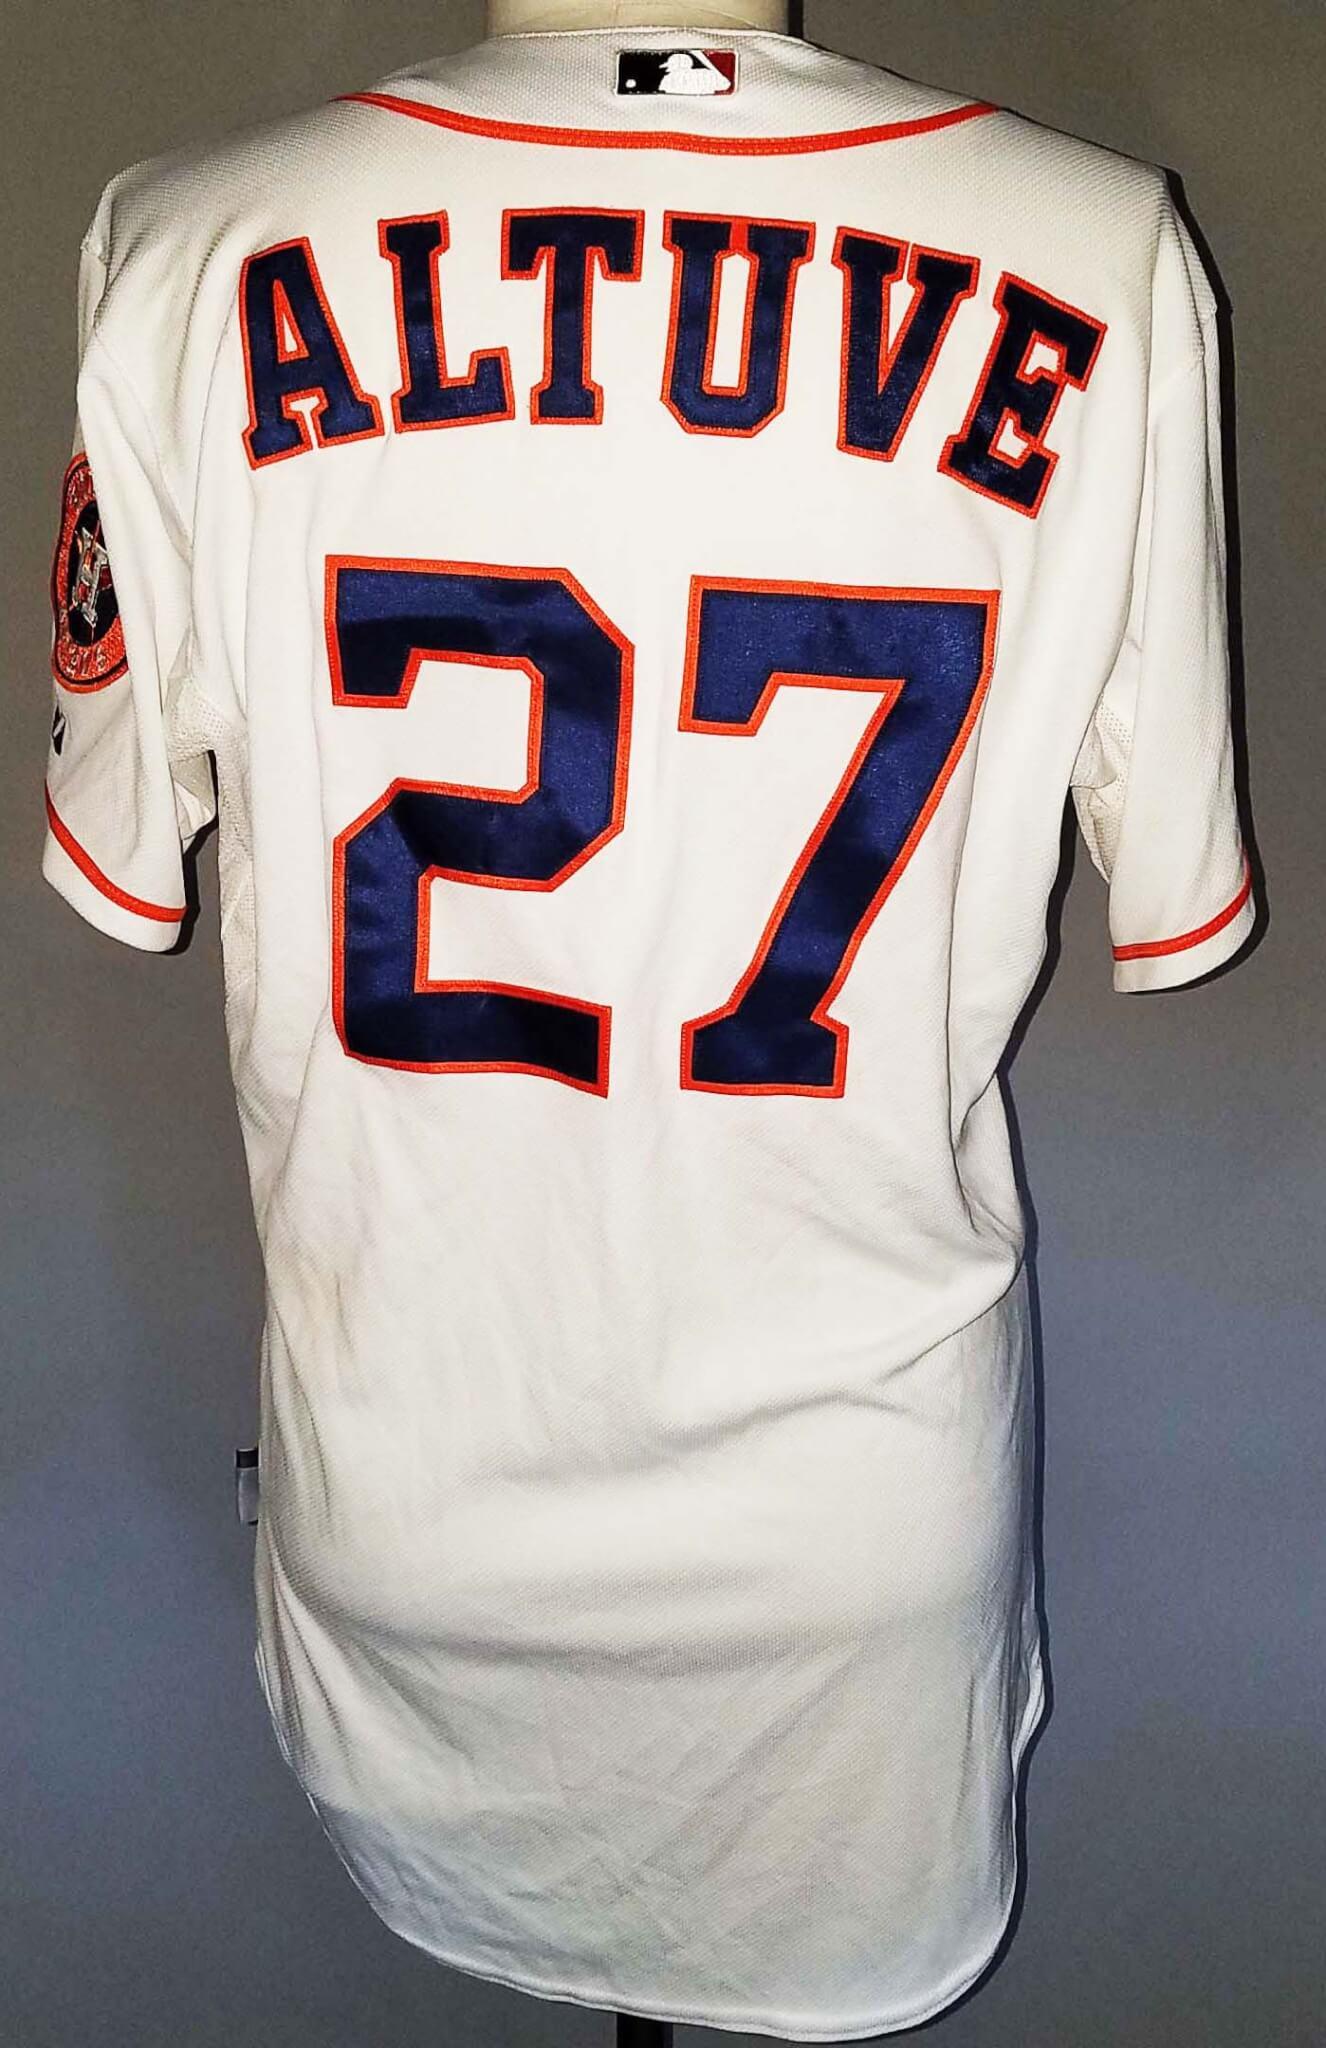 best sneakers 7fff1 4fd37 2014 Jose Altuve Houston Astros Game-Worn Jersey 9/18/14 vs. Indians - MLB  Hologram